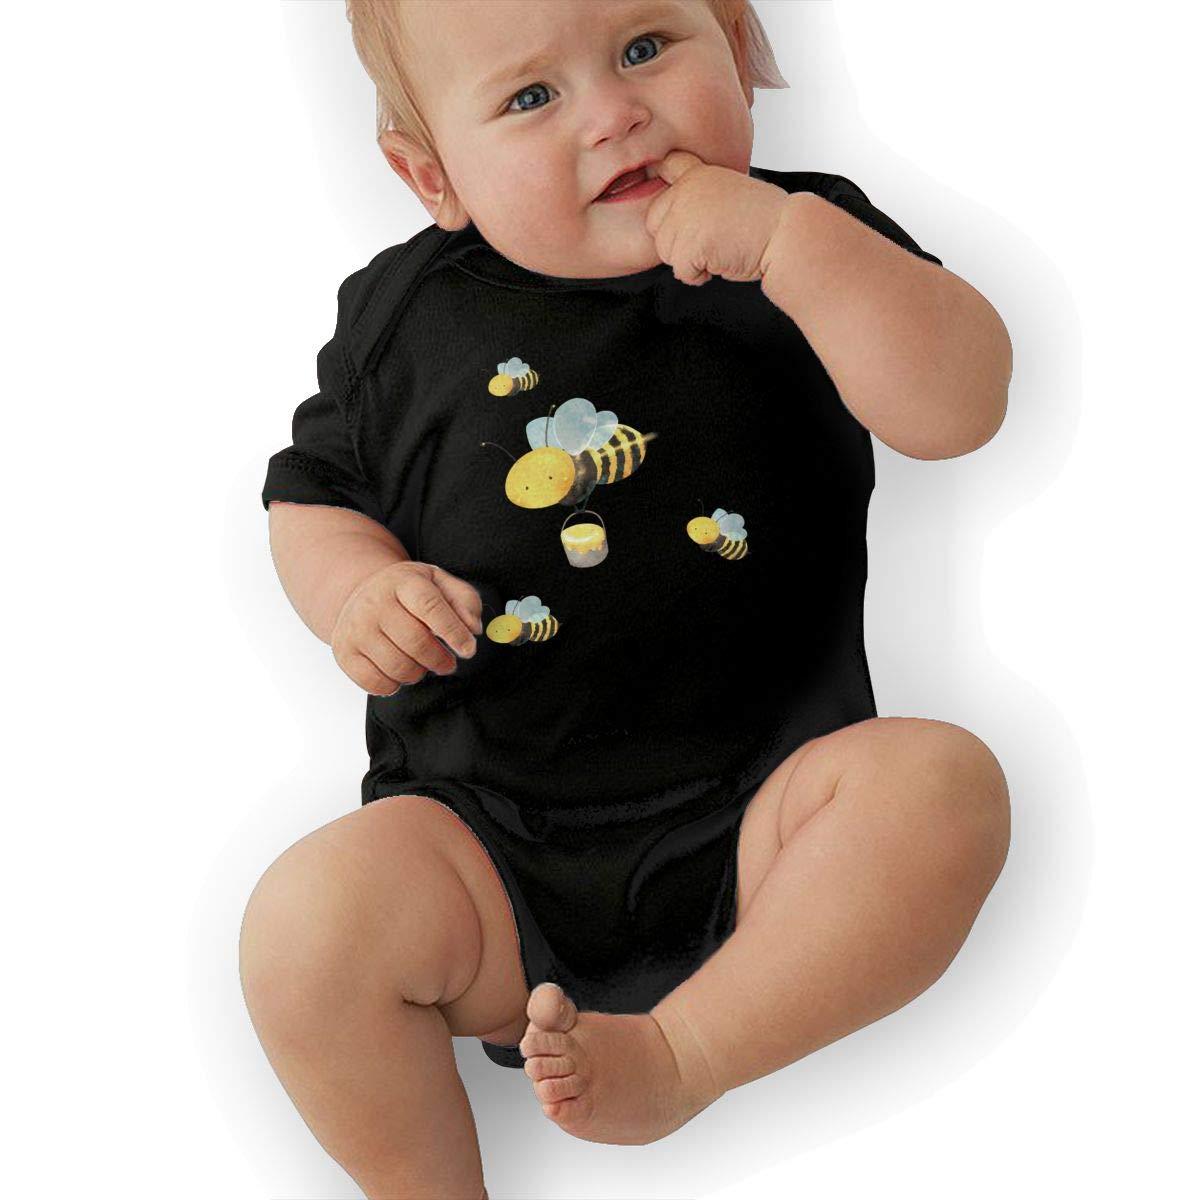 Dfenere Bees Fashion Newborn Baby Short Sleeve Bodysuit Romper Infant Summer Clothing